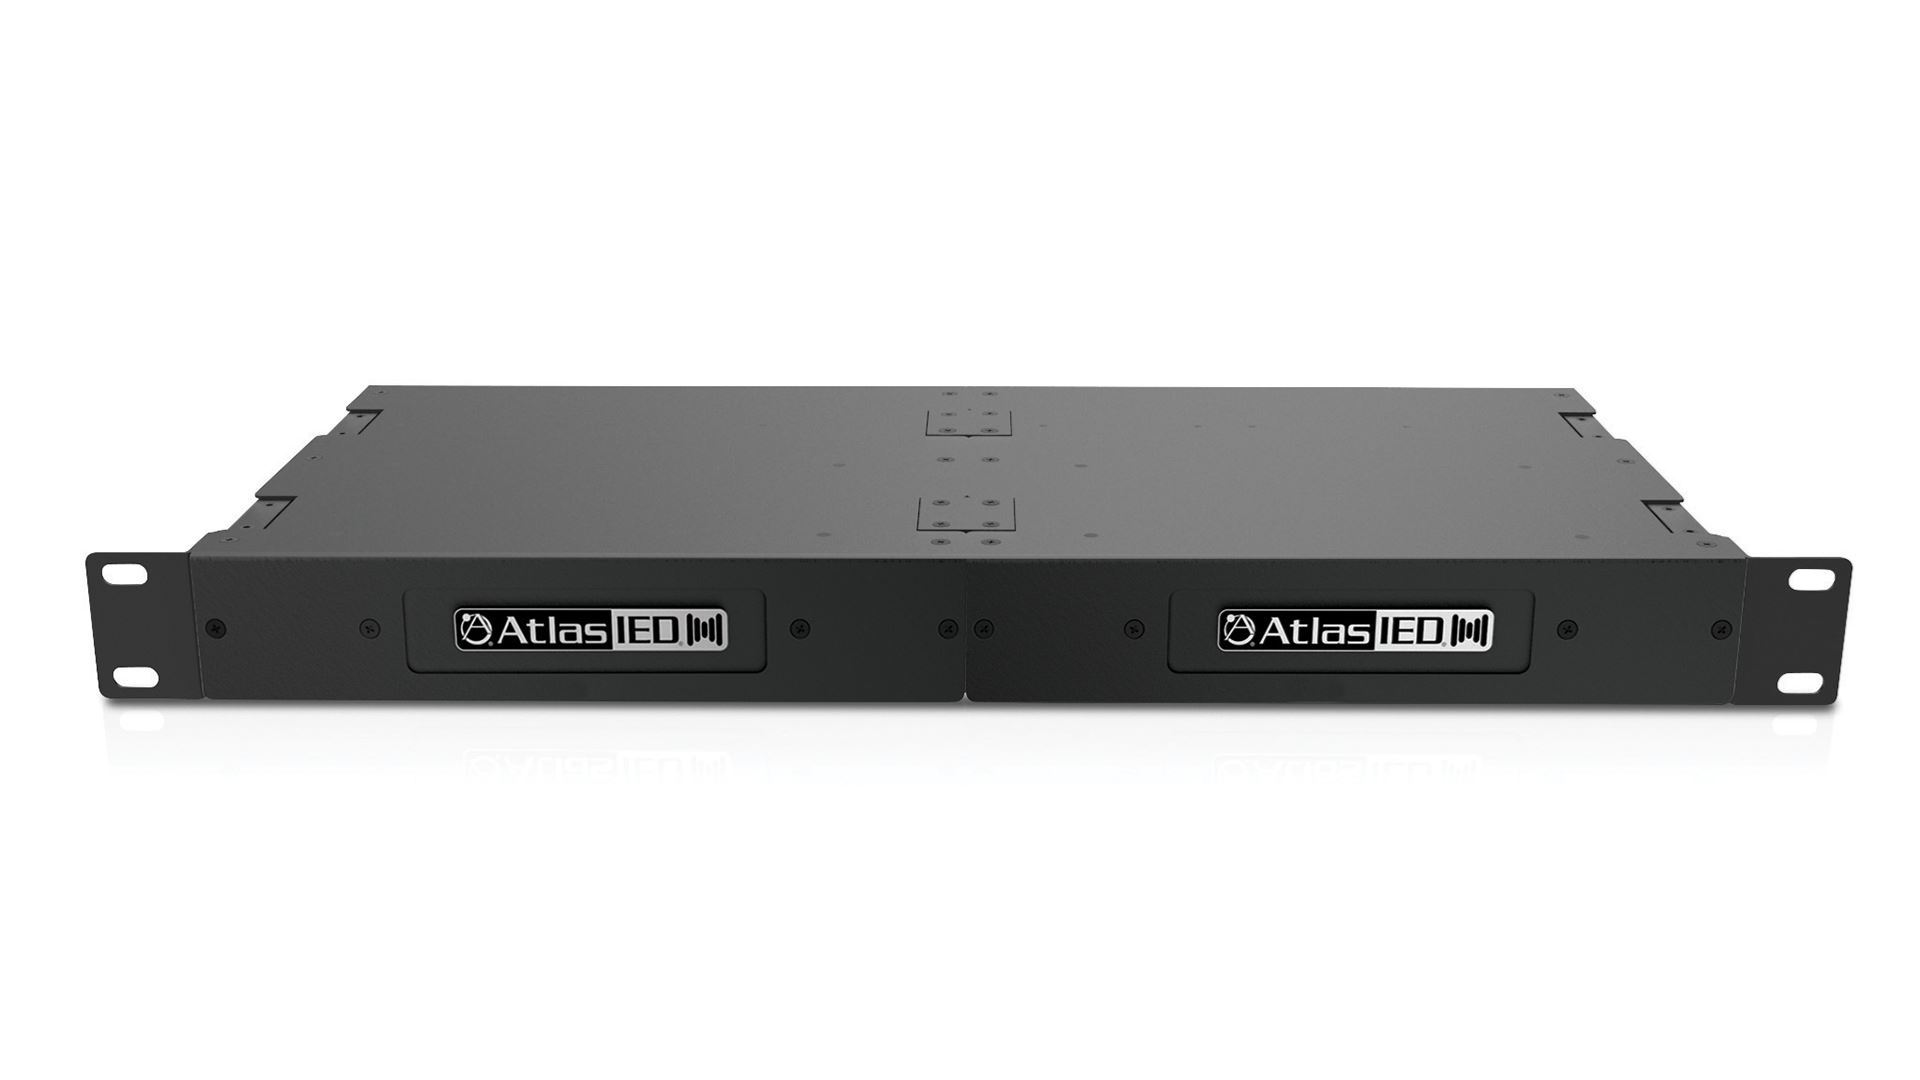 Poe Ip Addressable Digital To Analog Gateway W Line Level Out Telephone Wiring On Lju 2 3a Extension Socket Atlasied